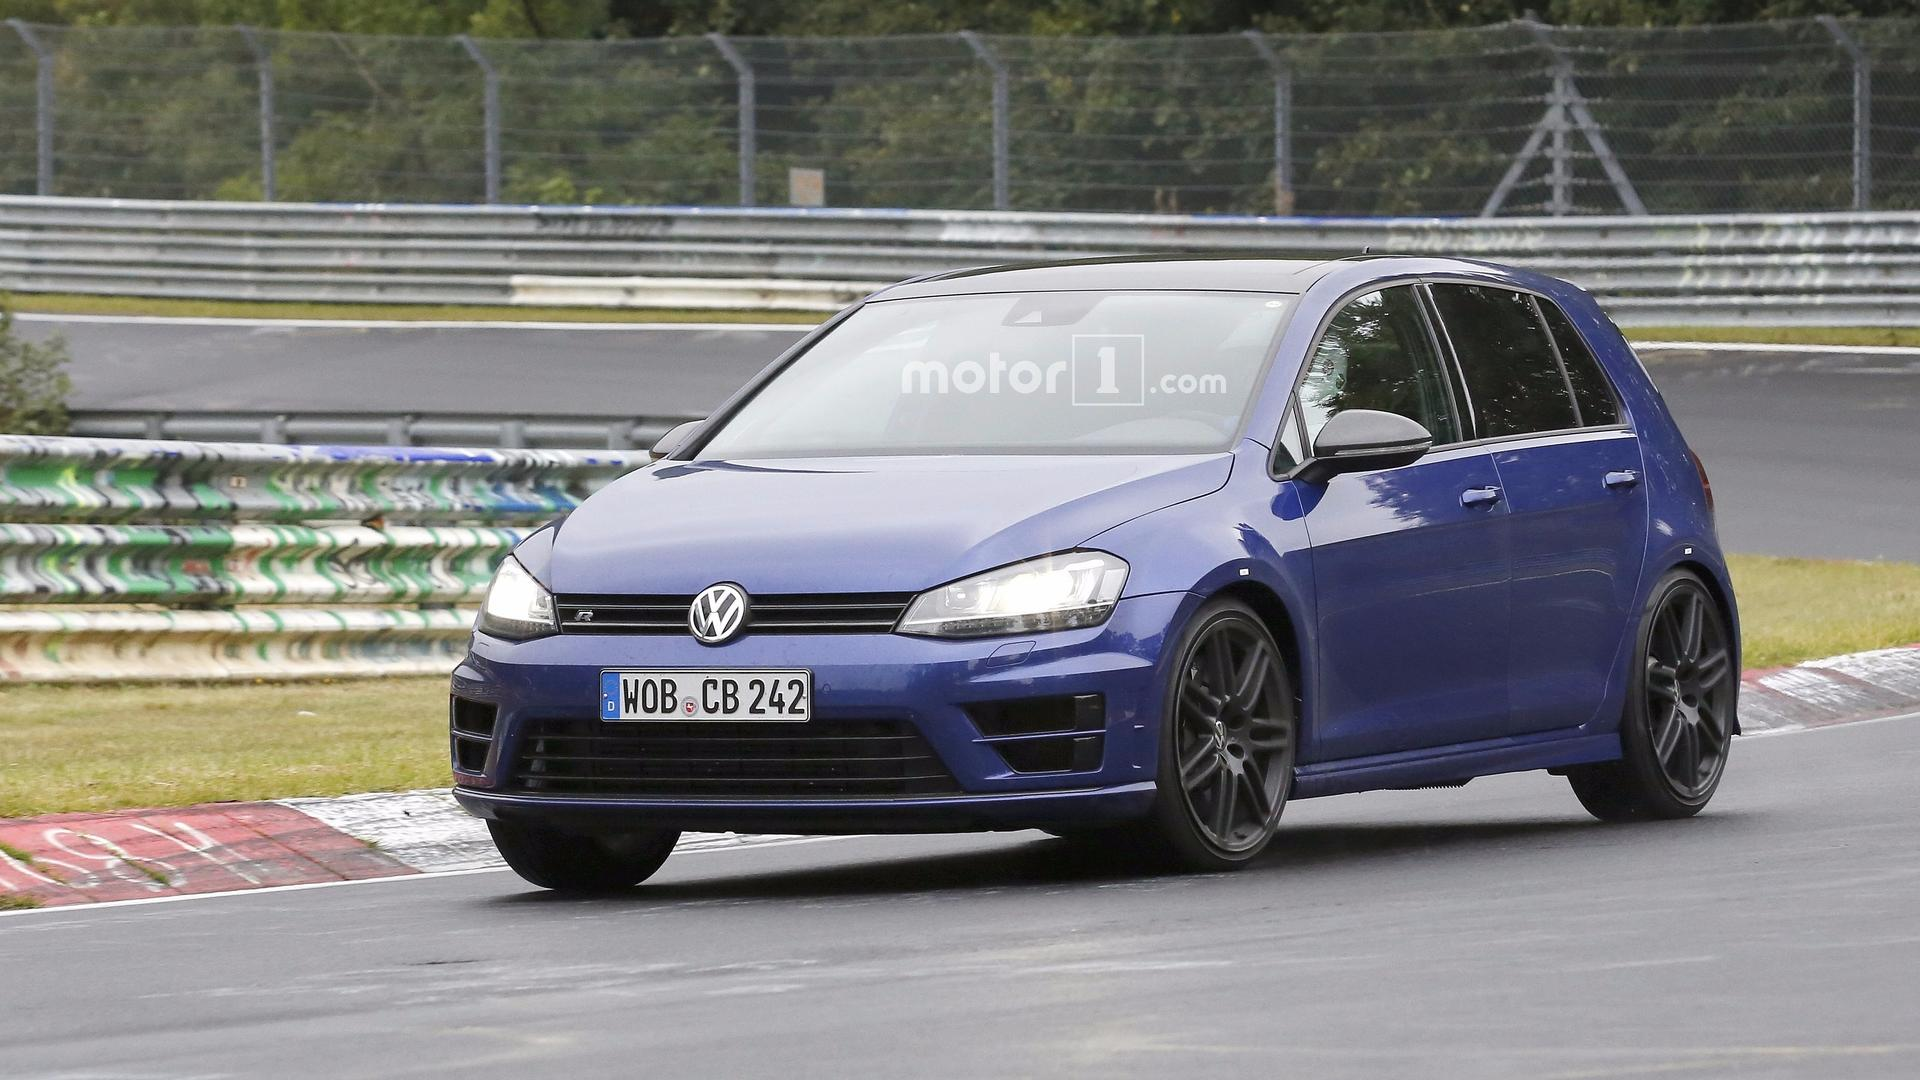 Volkswagen снова вывел на тесты заряженный хэтчбек Golf R420